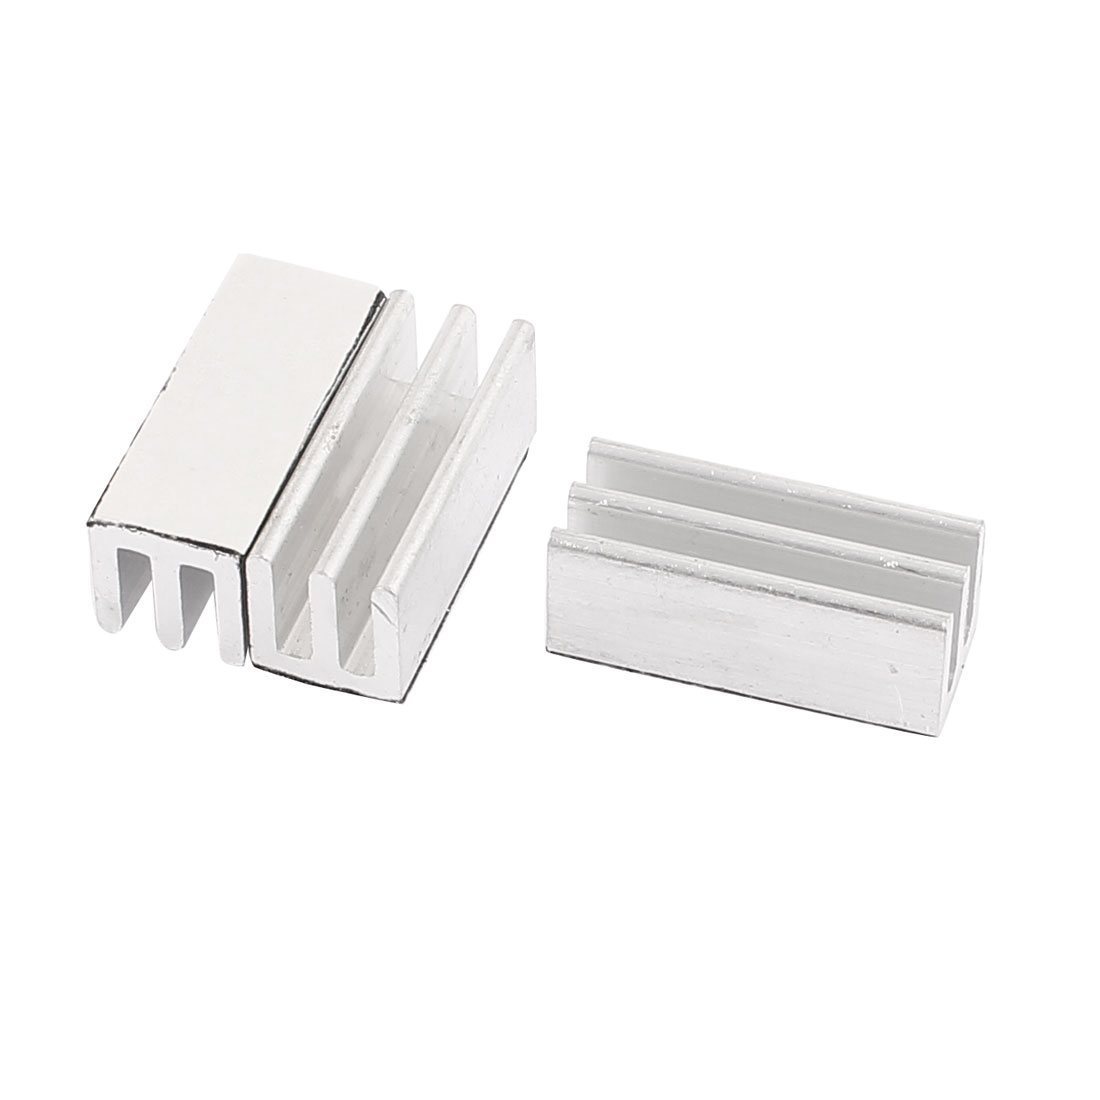 3Pcs Extruded Aluminum Heatsink 25 x 10 x 10mm Chip CPU VGA RAM LED IC Radiator